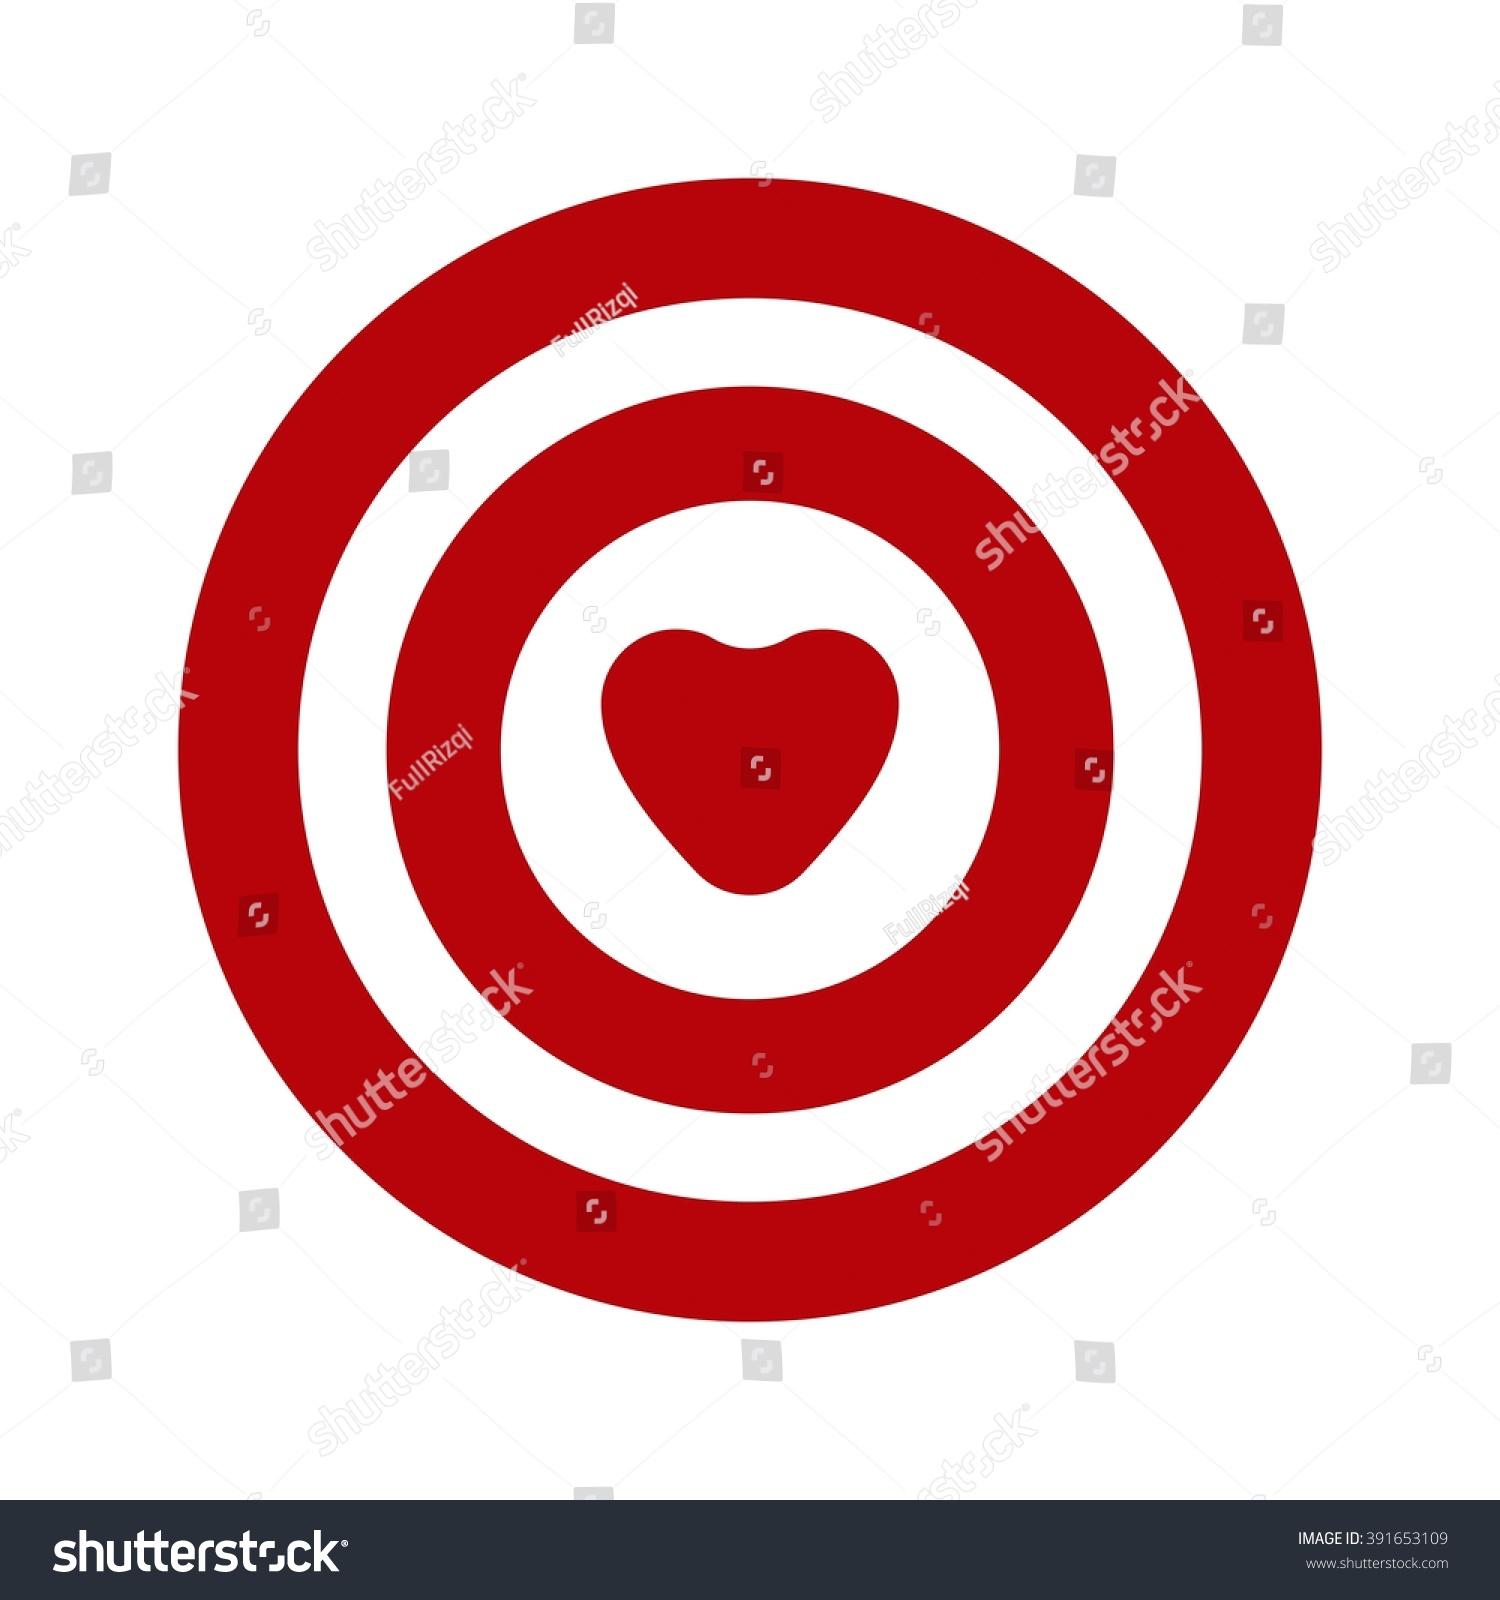 Love symbol target stock vector 391653109 shutterstock buycottarizona Image collections